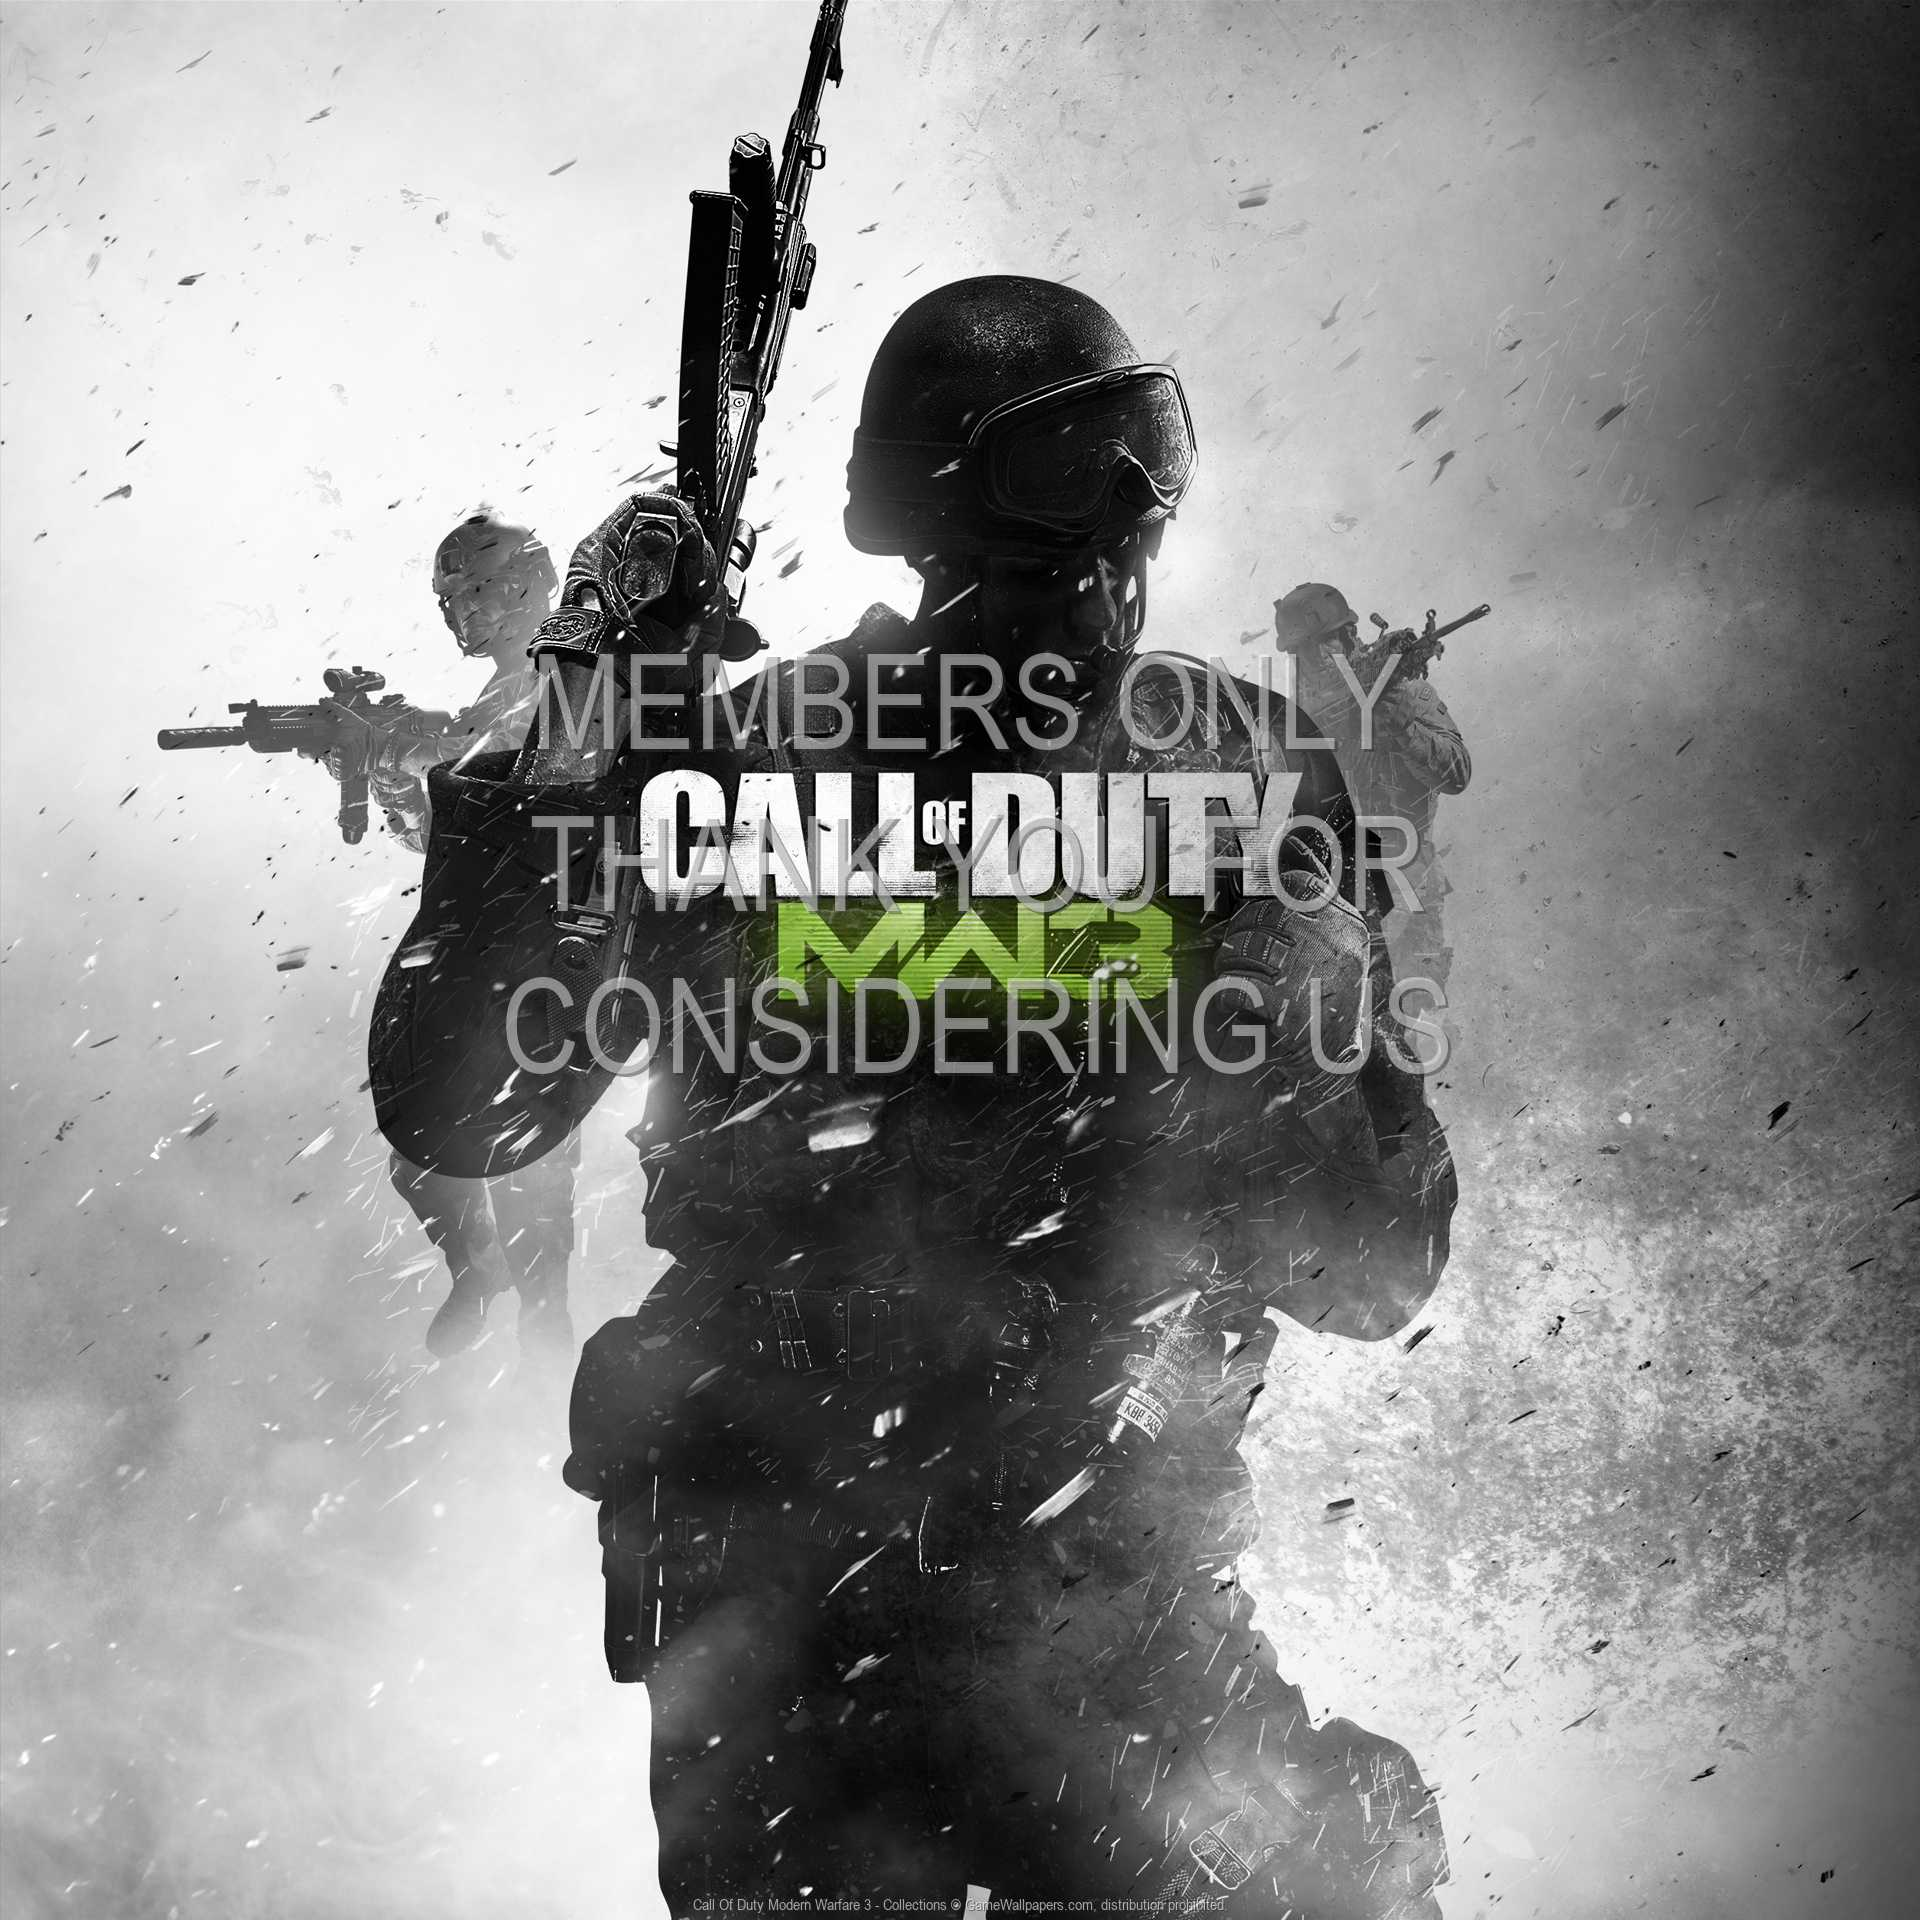 Call Of Duty: Modern Warfare 3 - Collections 1080p Horizontal Handy Hintergrundbild 02